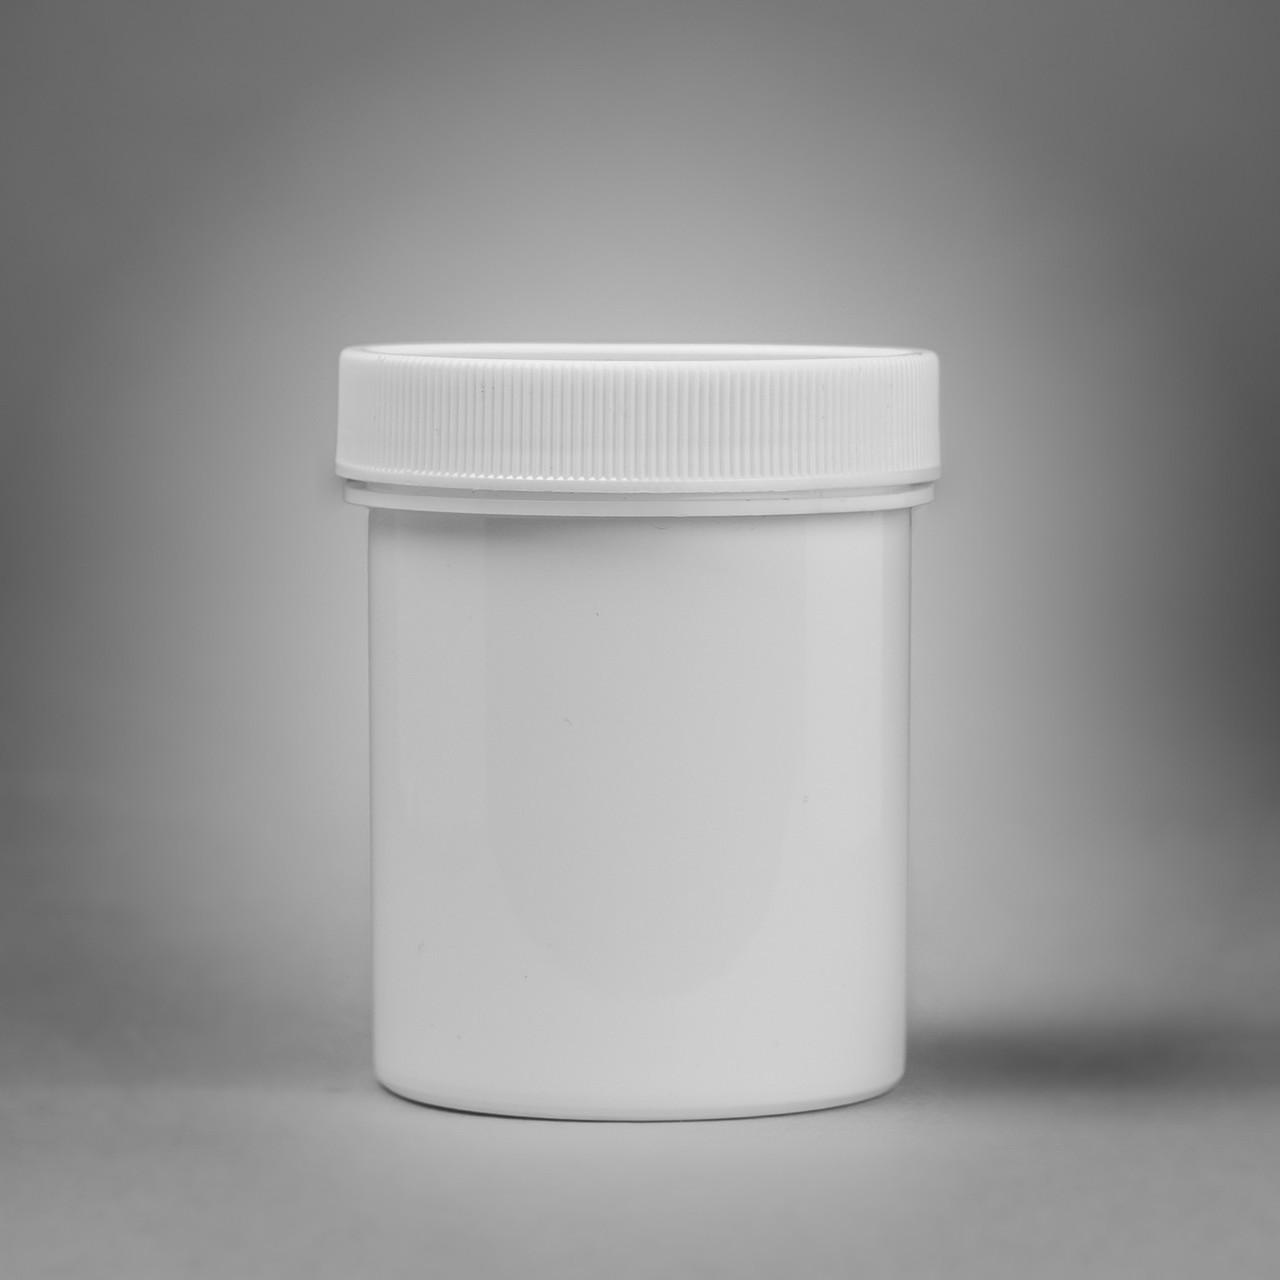 SCREW CAP 118.0ML (4OZ) POLYPROPYLENE JARS (PACK OF 12)